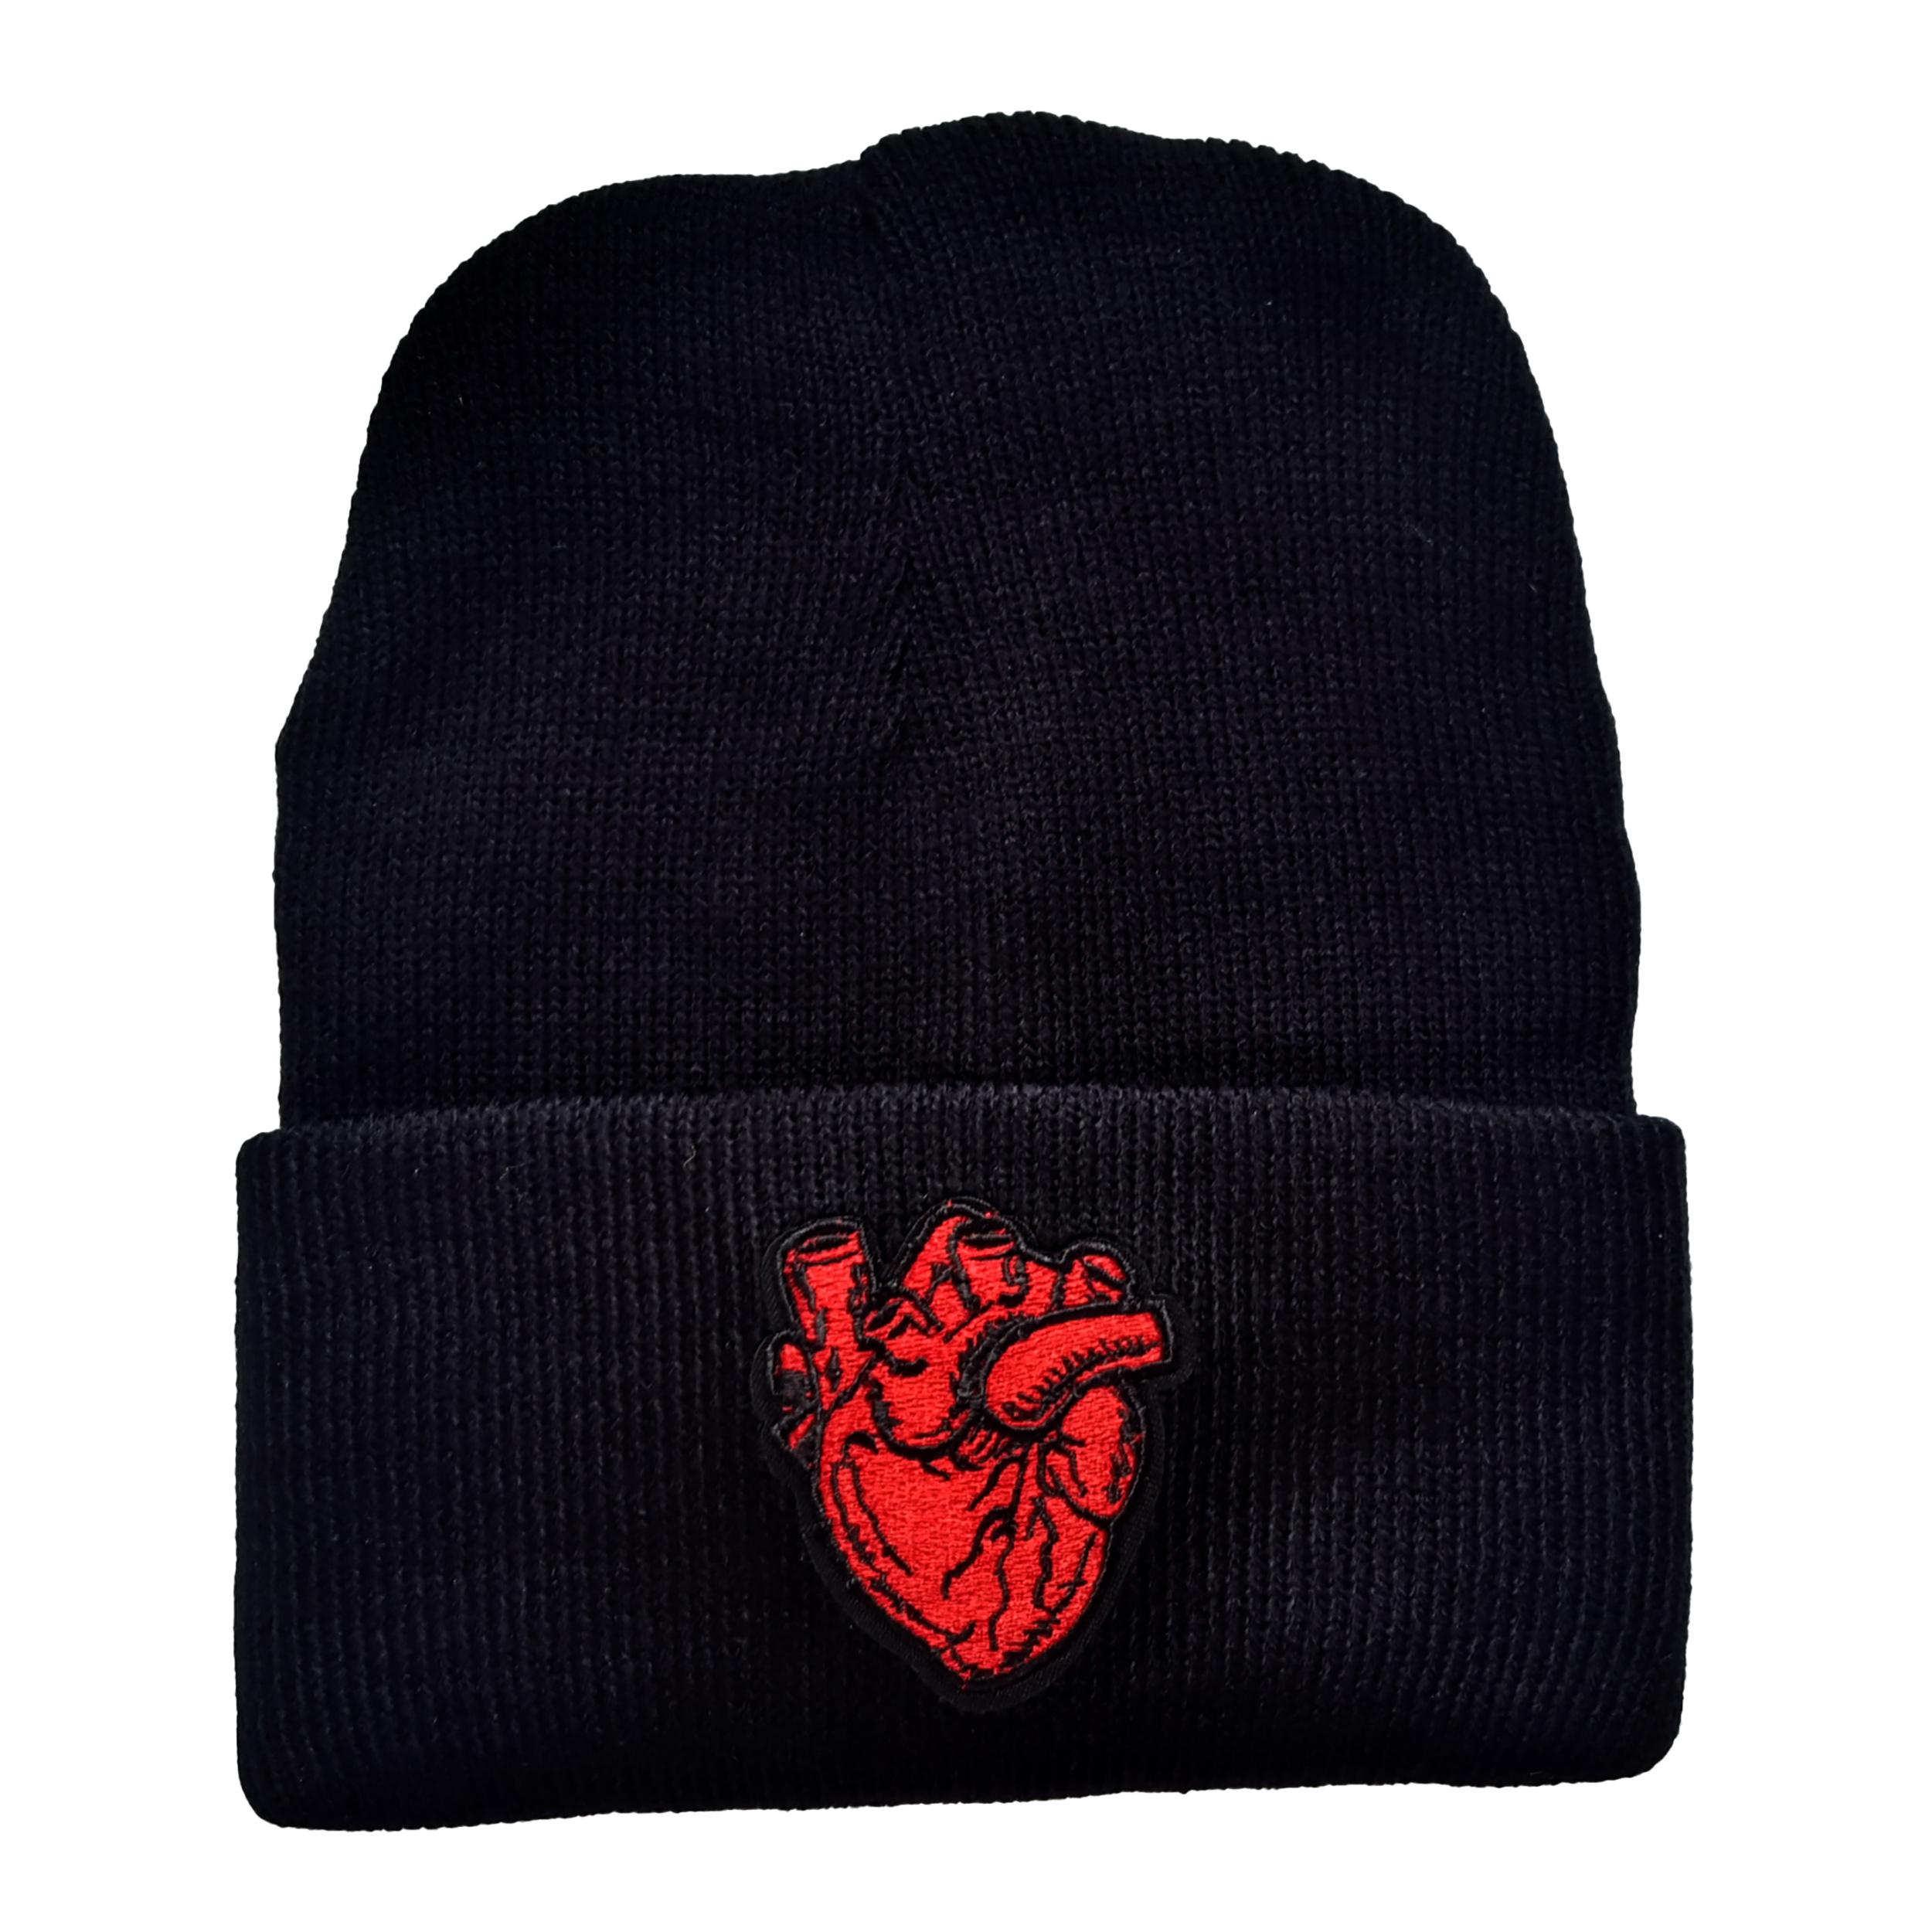 کلاه بافتنی طرح قلب کد KO-18